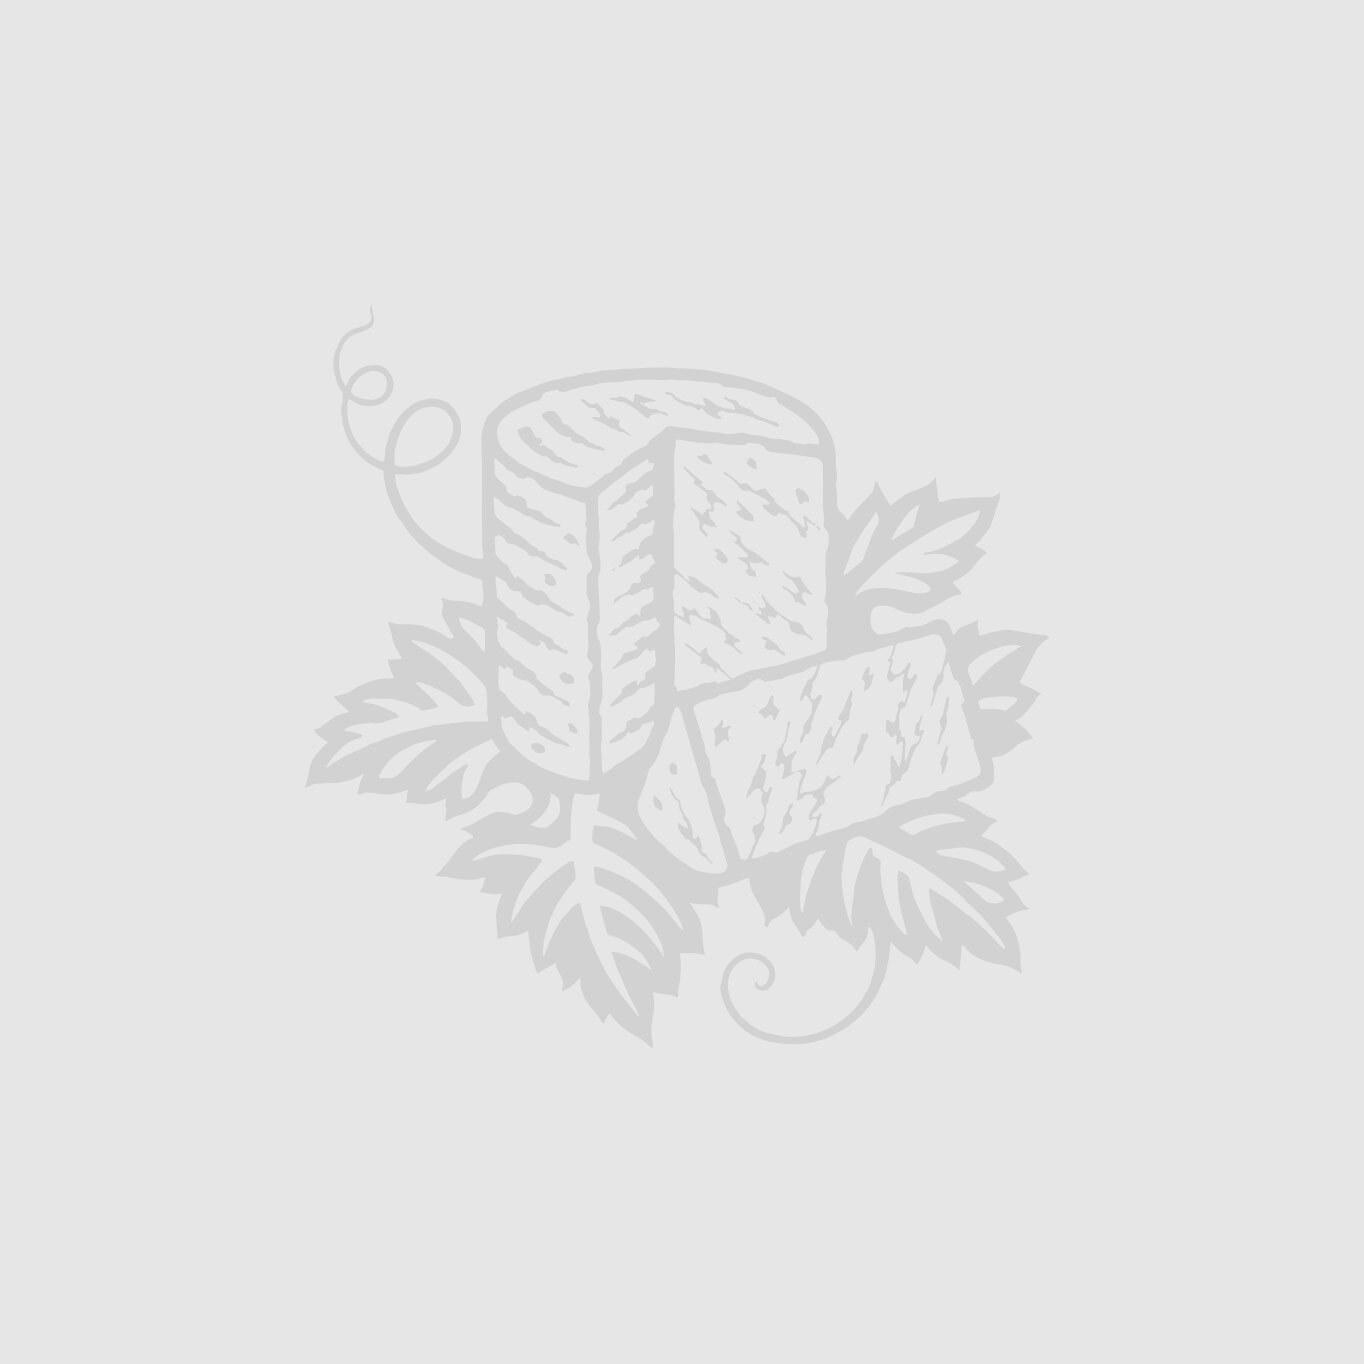 Shell-Shaped Pasta Gnocchi Sardi di Gragnano IGP Dolce & Gabbana